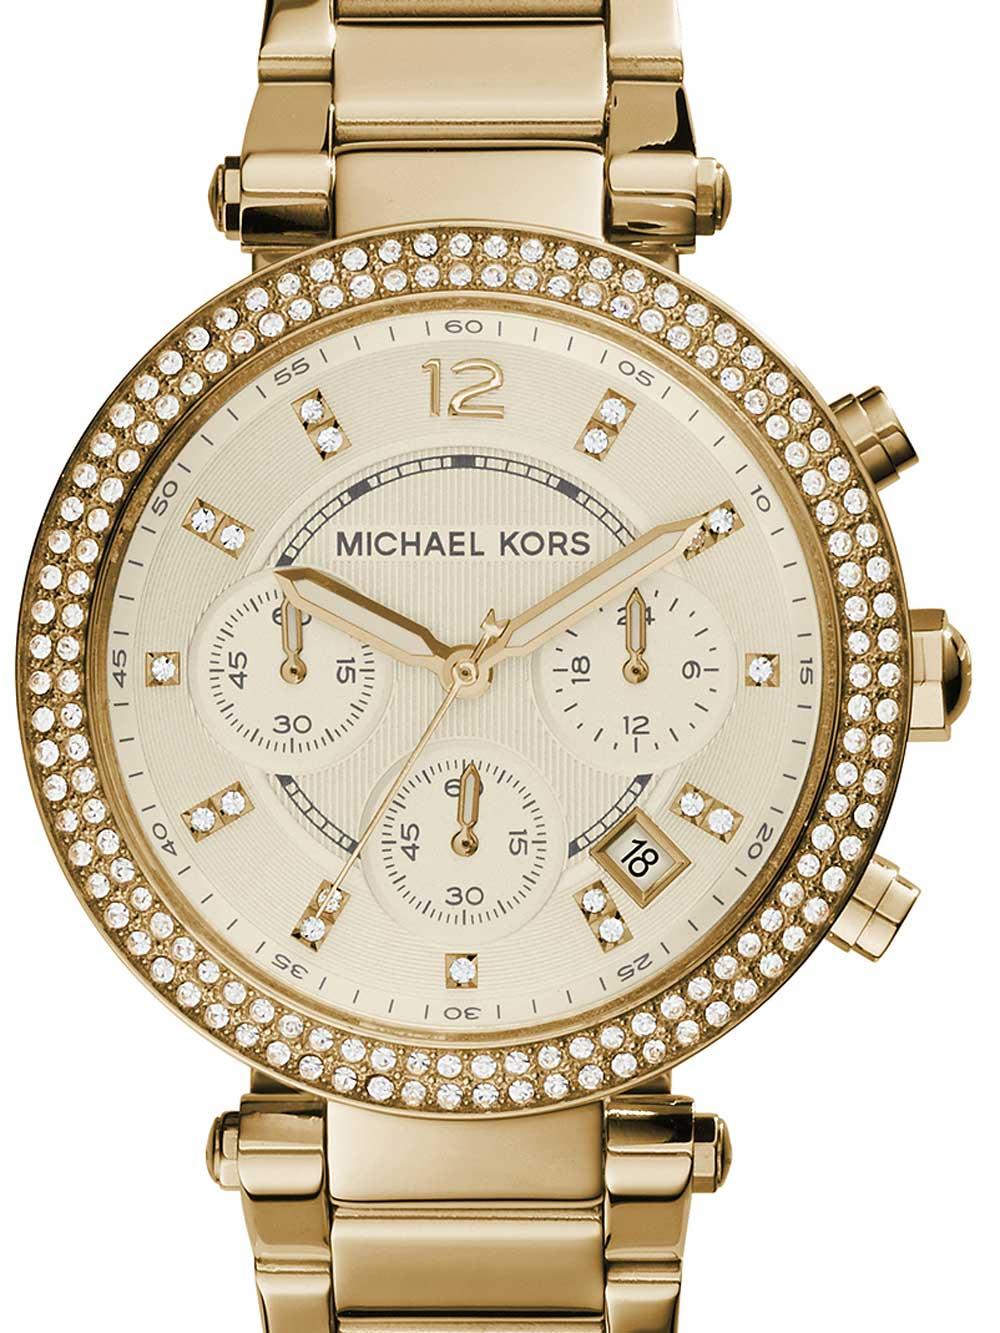 Michael Kors MK5354 Parker Chronograph Damen 39mm 10ATM